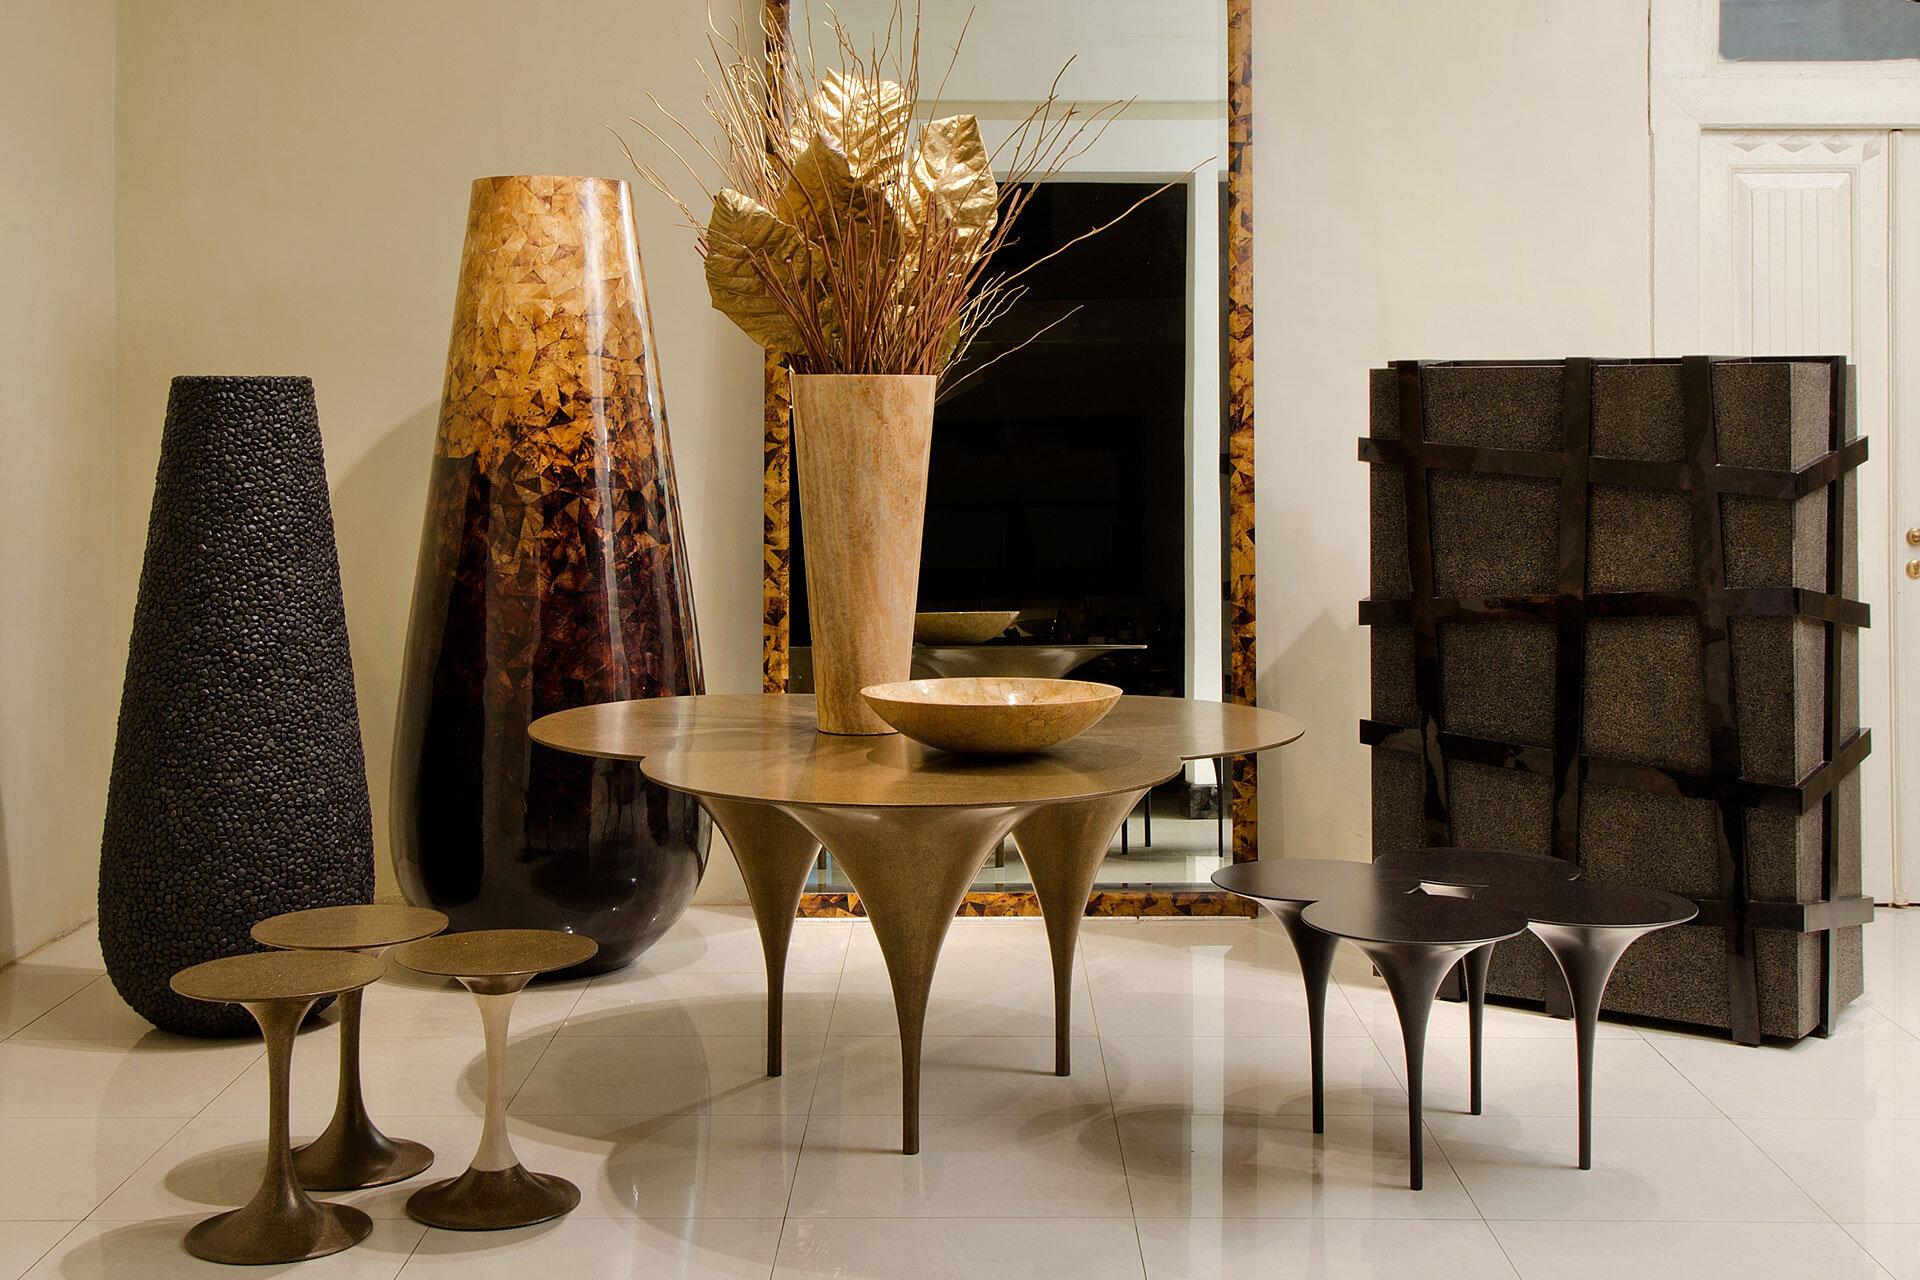 Original Furniture With Innovative Materials By Carlo Pessina